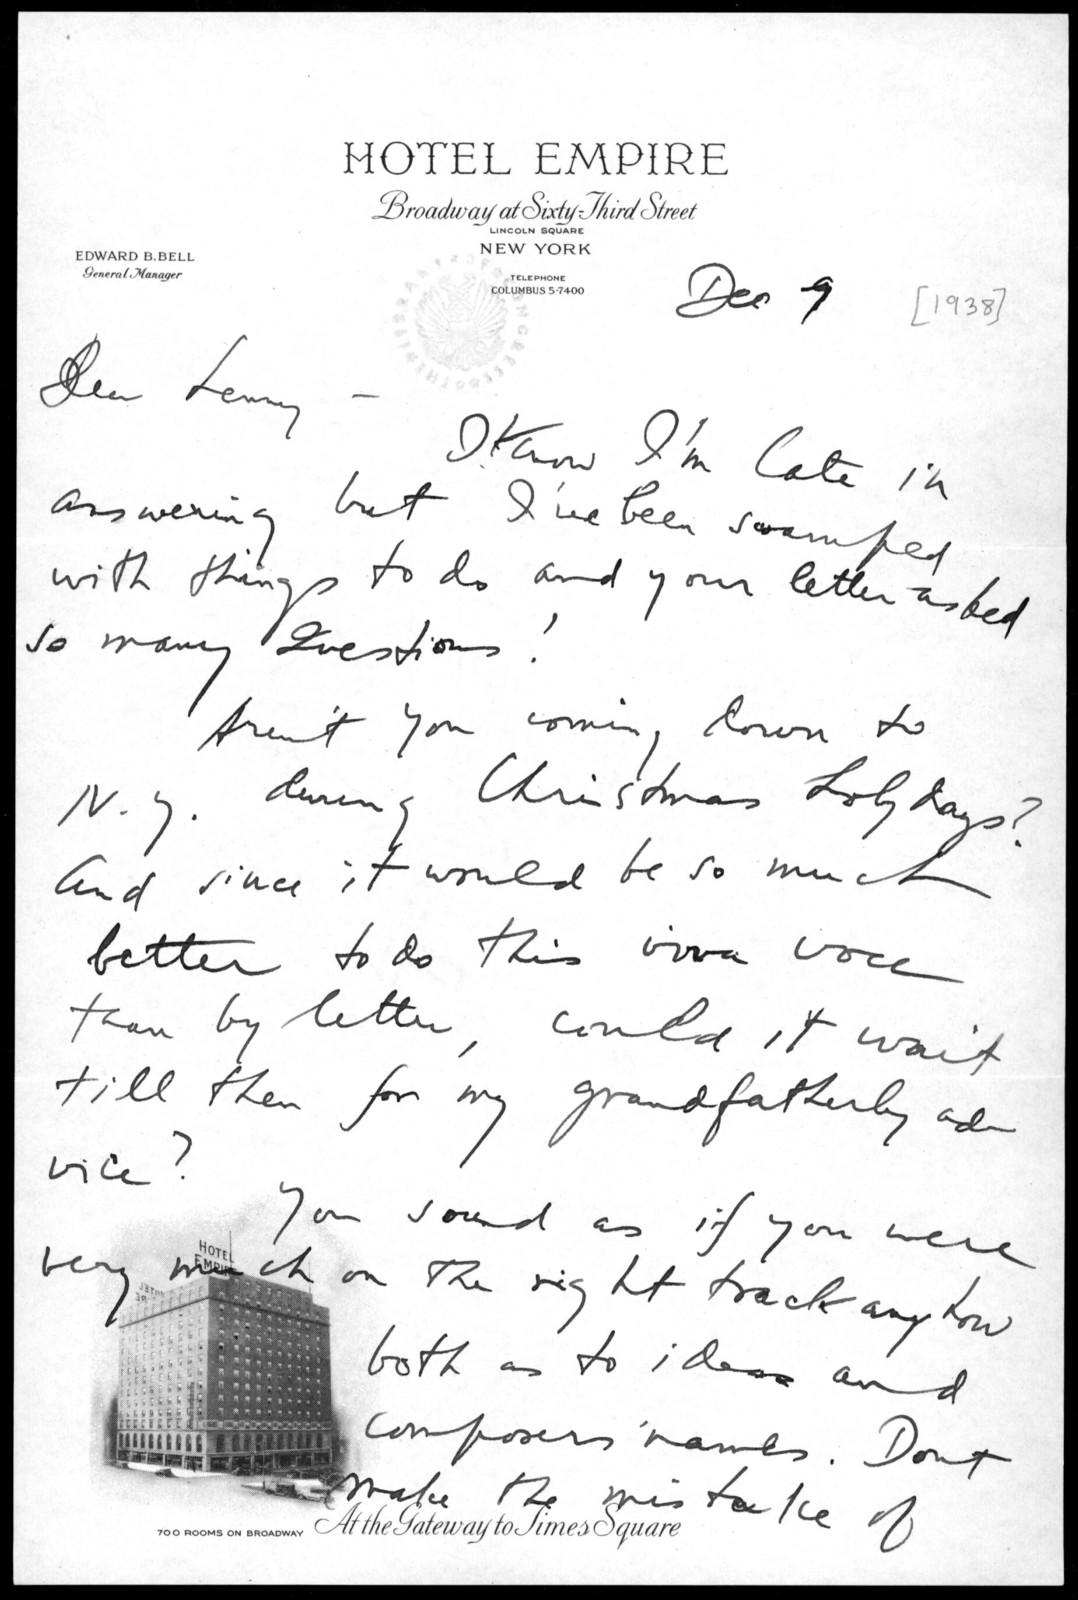 Letter from Aaron Copland to Leonard Bernstein, December 9, 1938